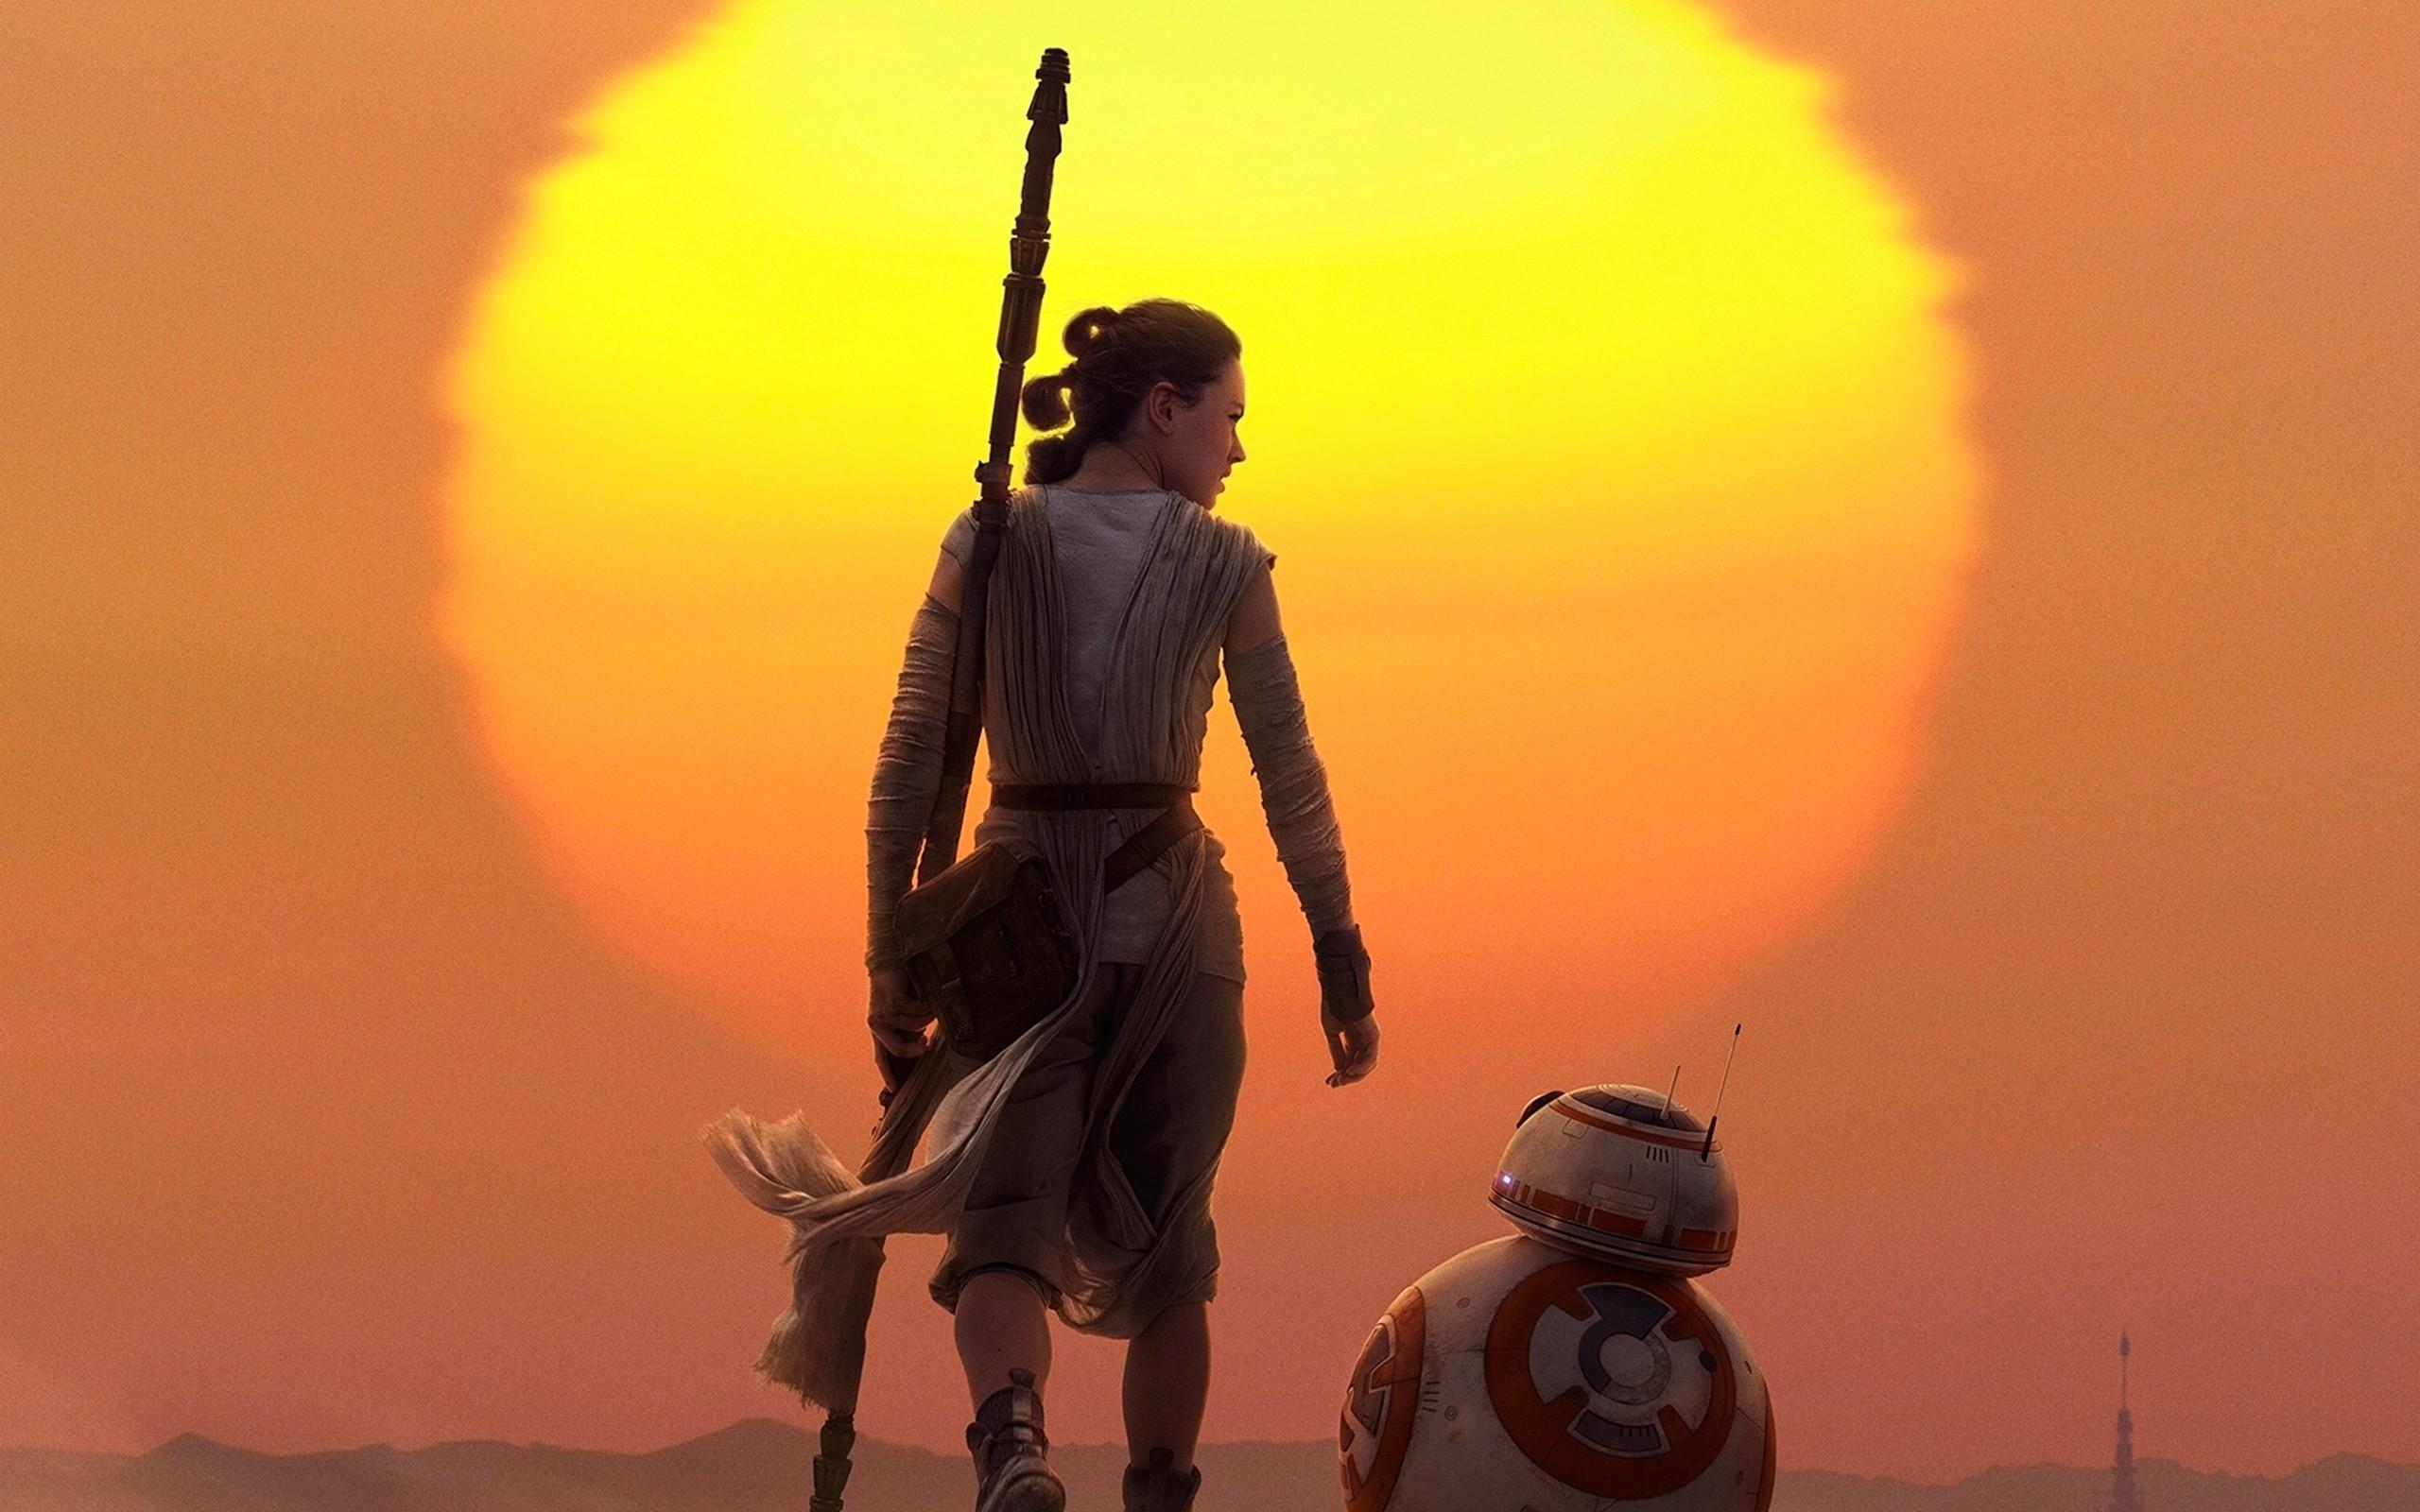 Star Wars Rey And Bb8 2560x1600 Wallpaper Teahub Io